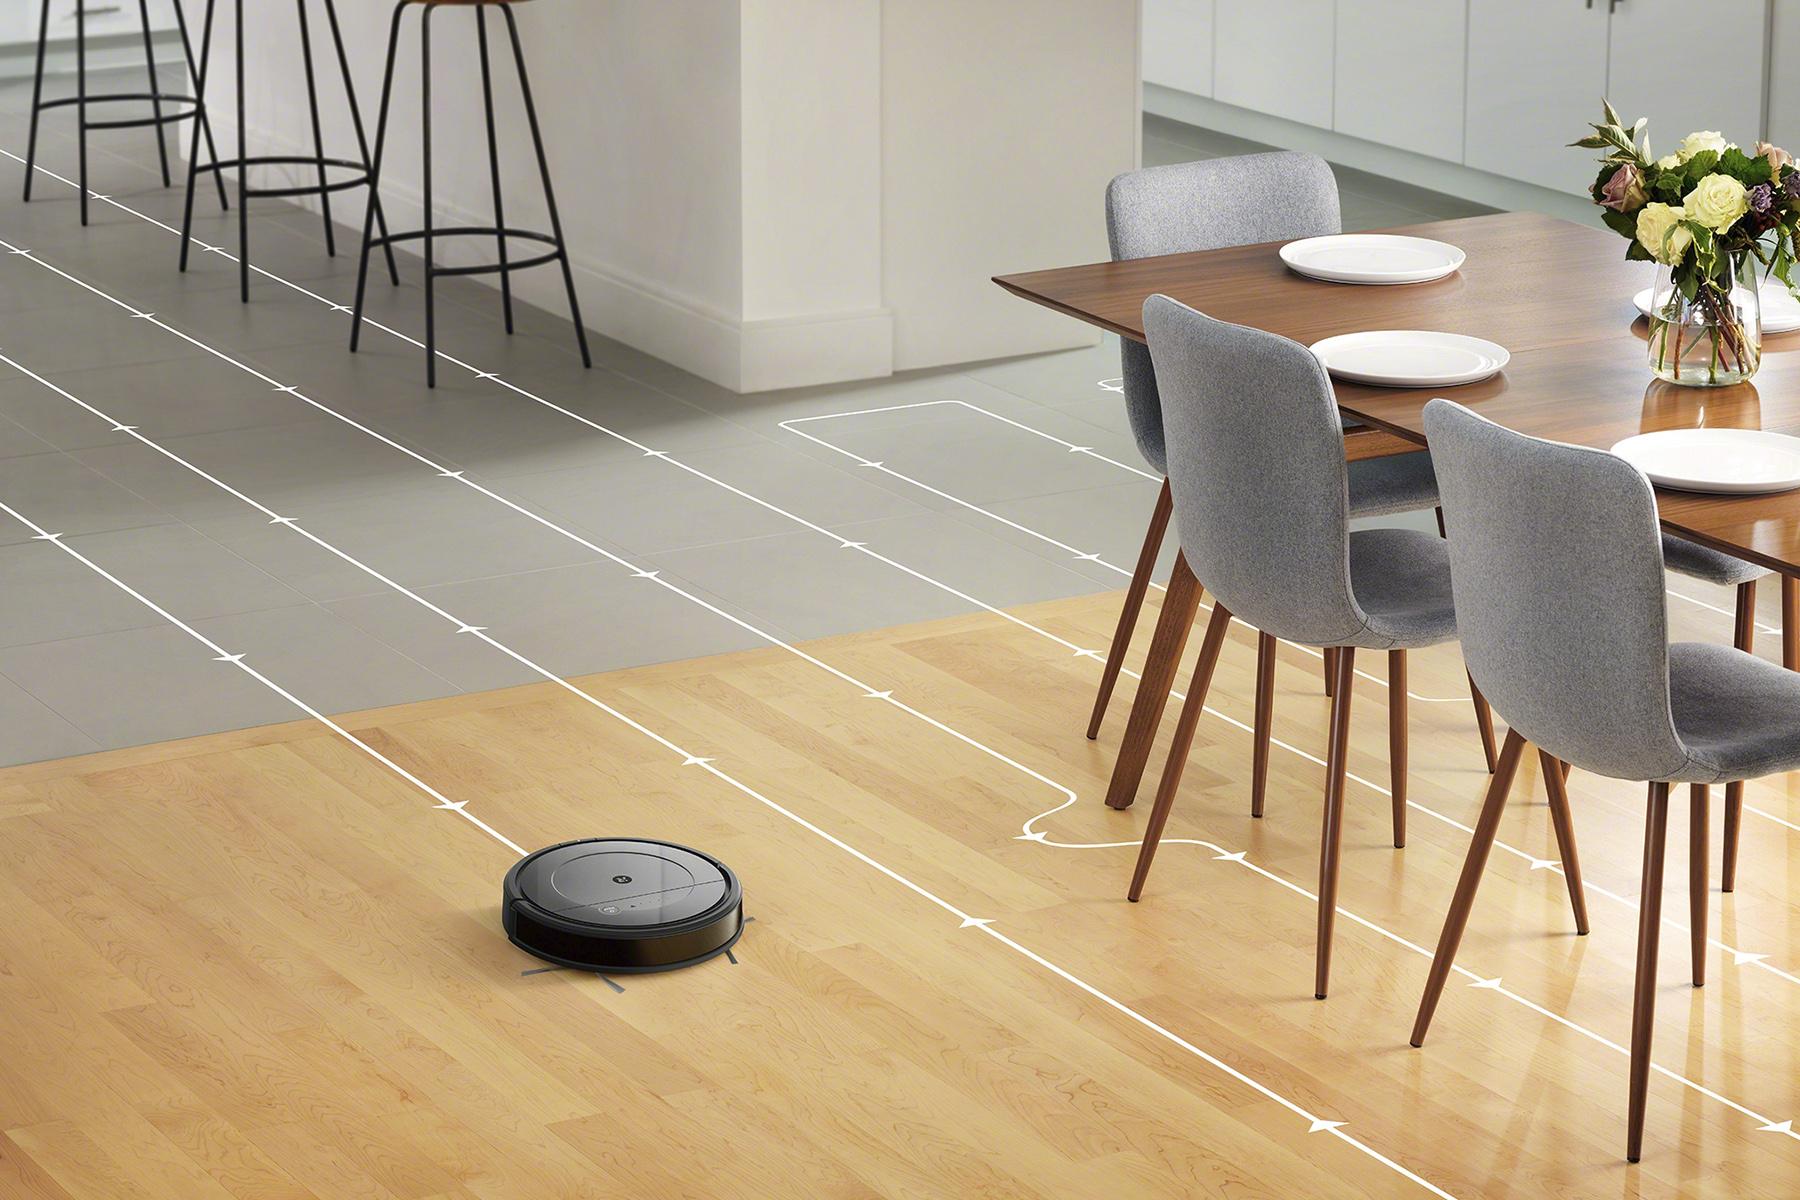 iRobot Roomba Combo gyroskopická navigace